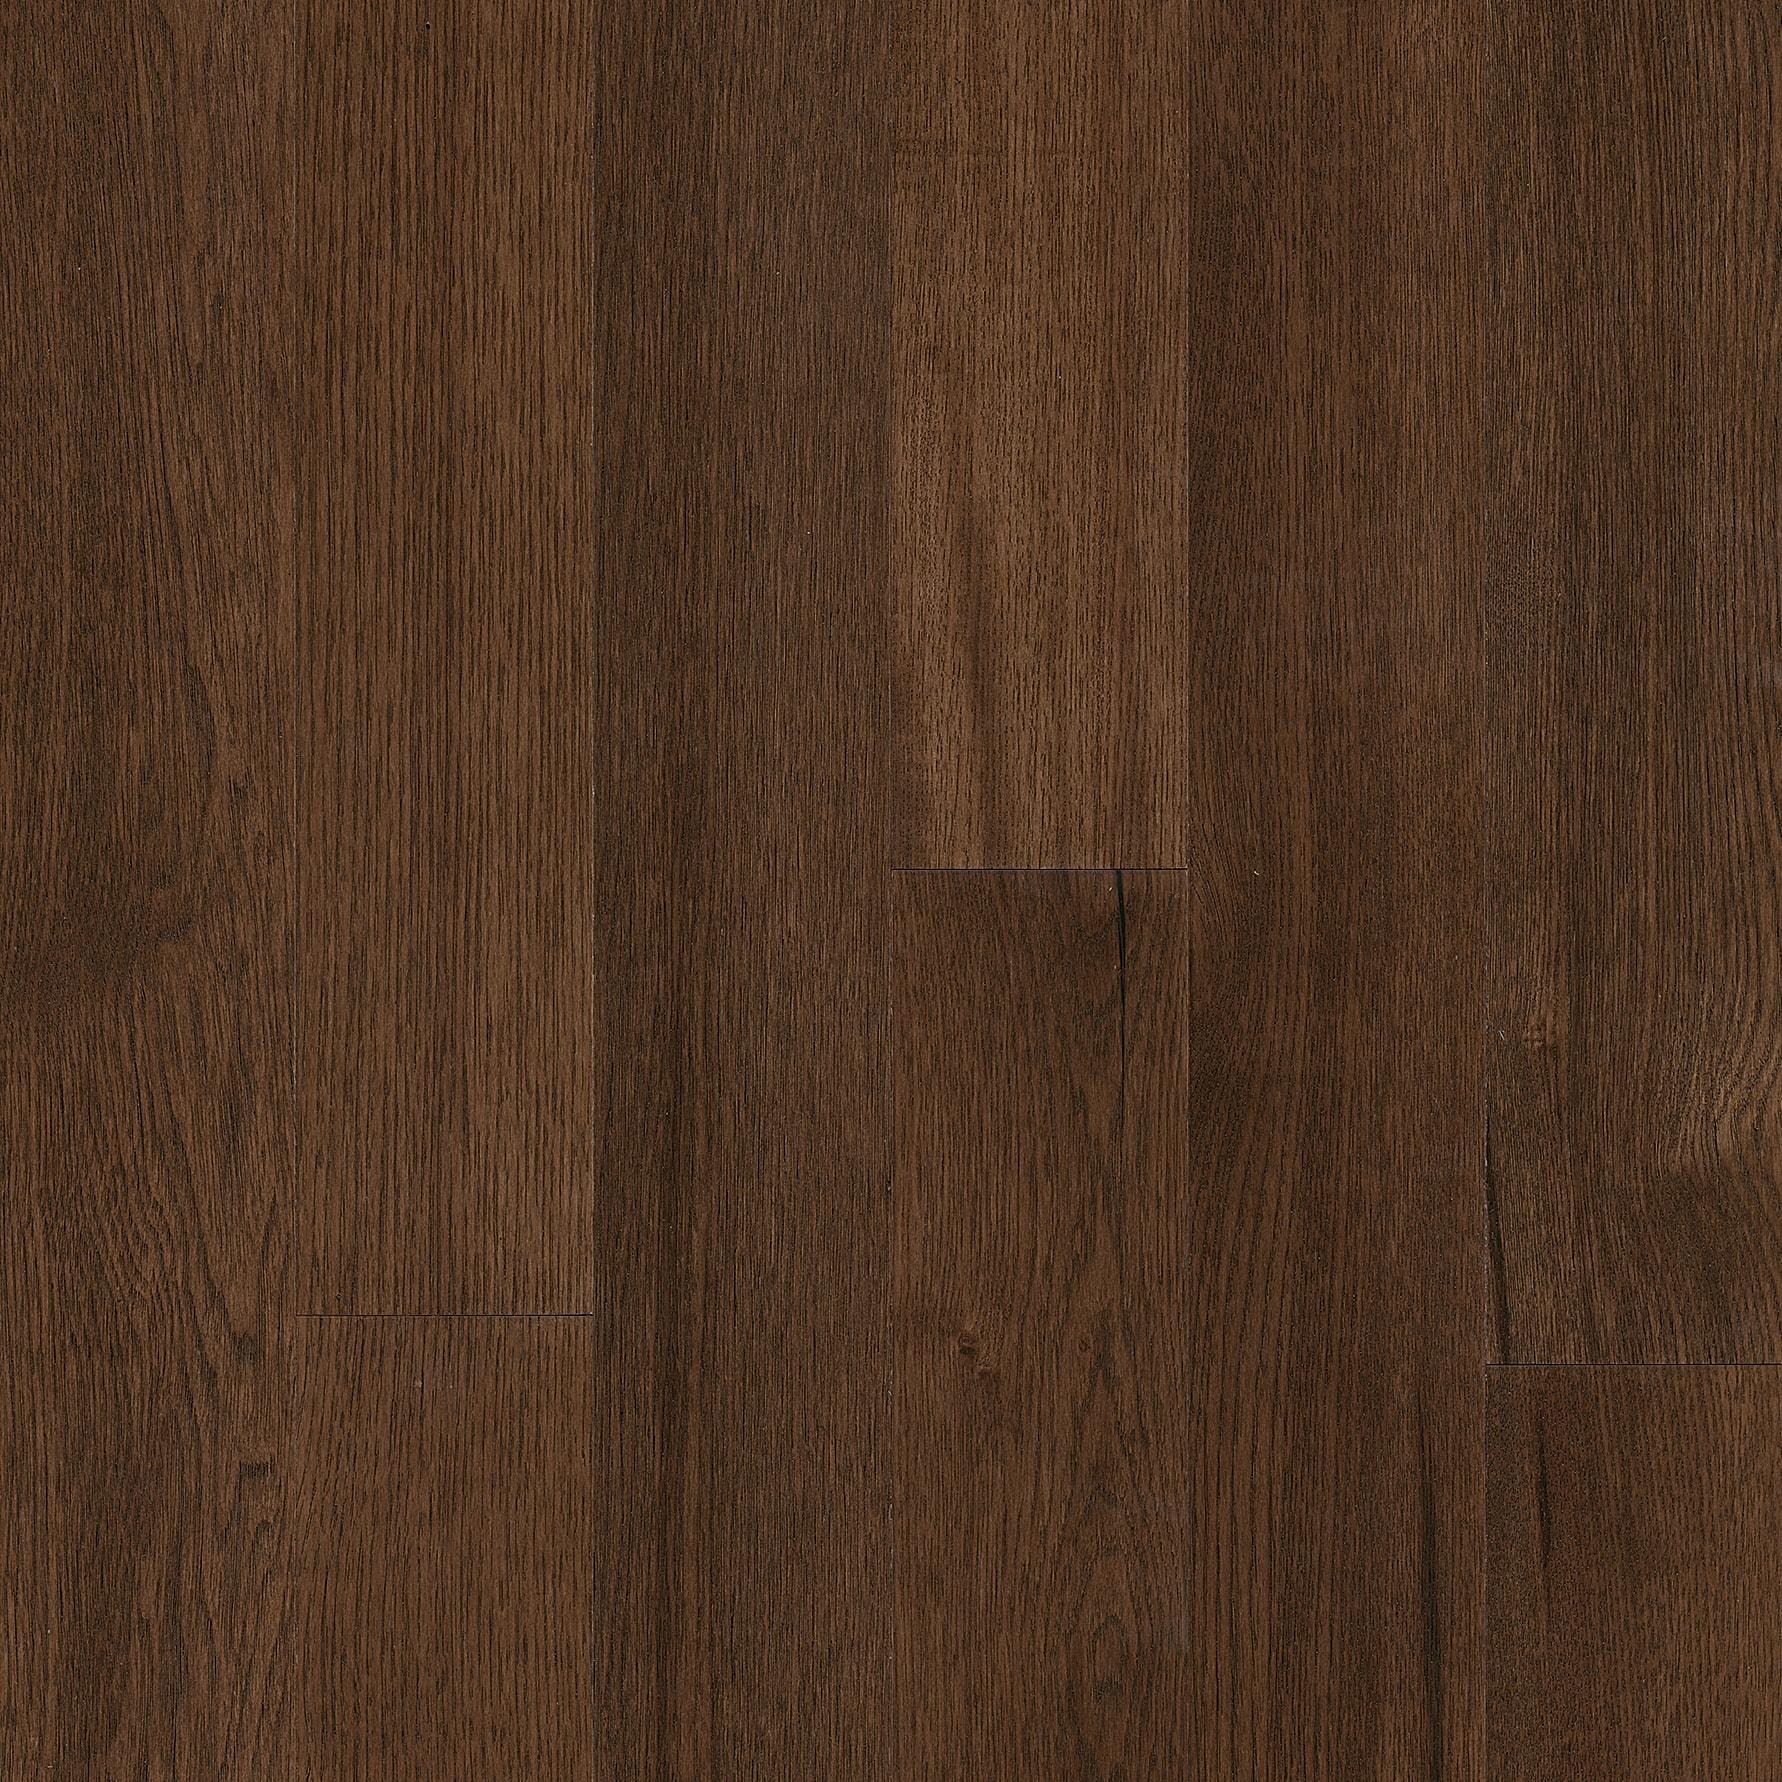 Medium brown hardwood floor